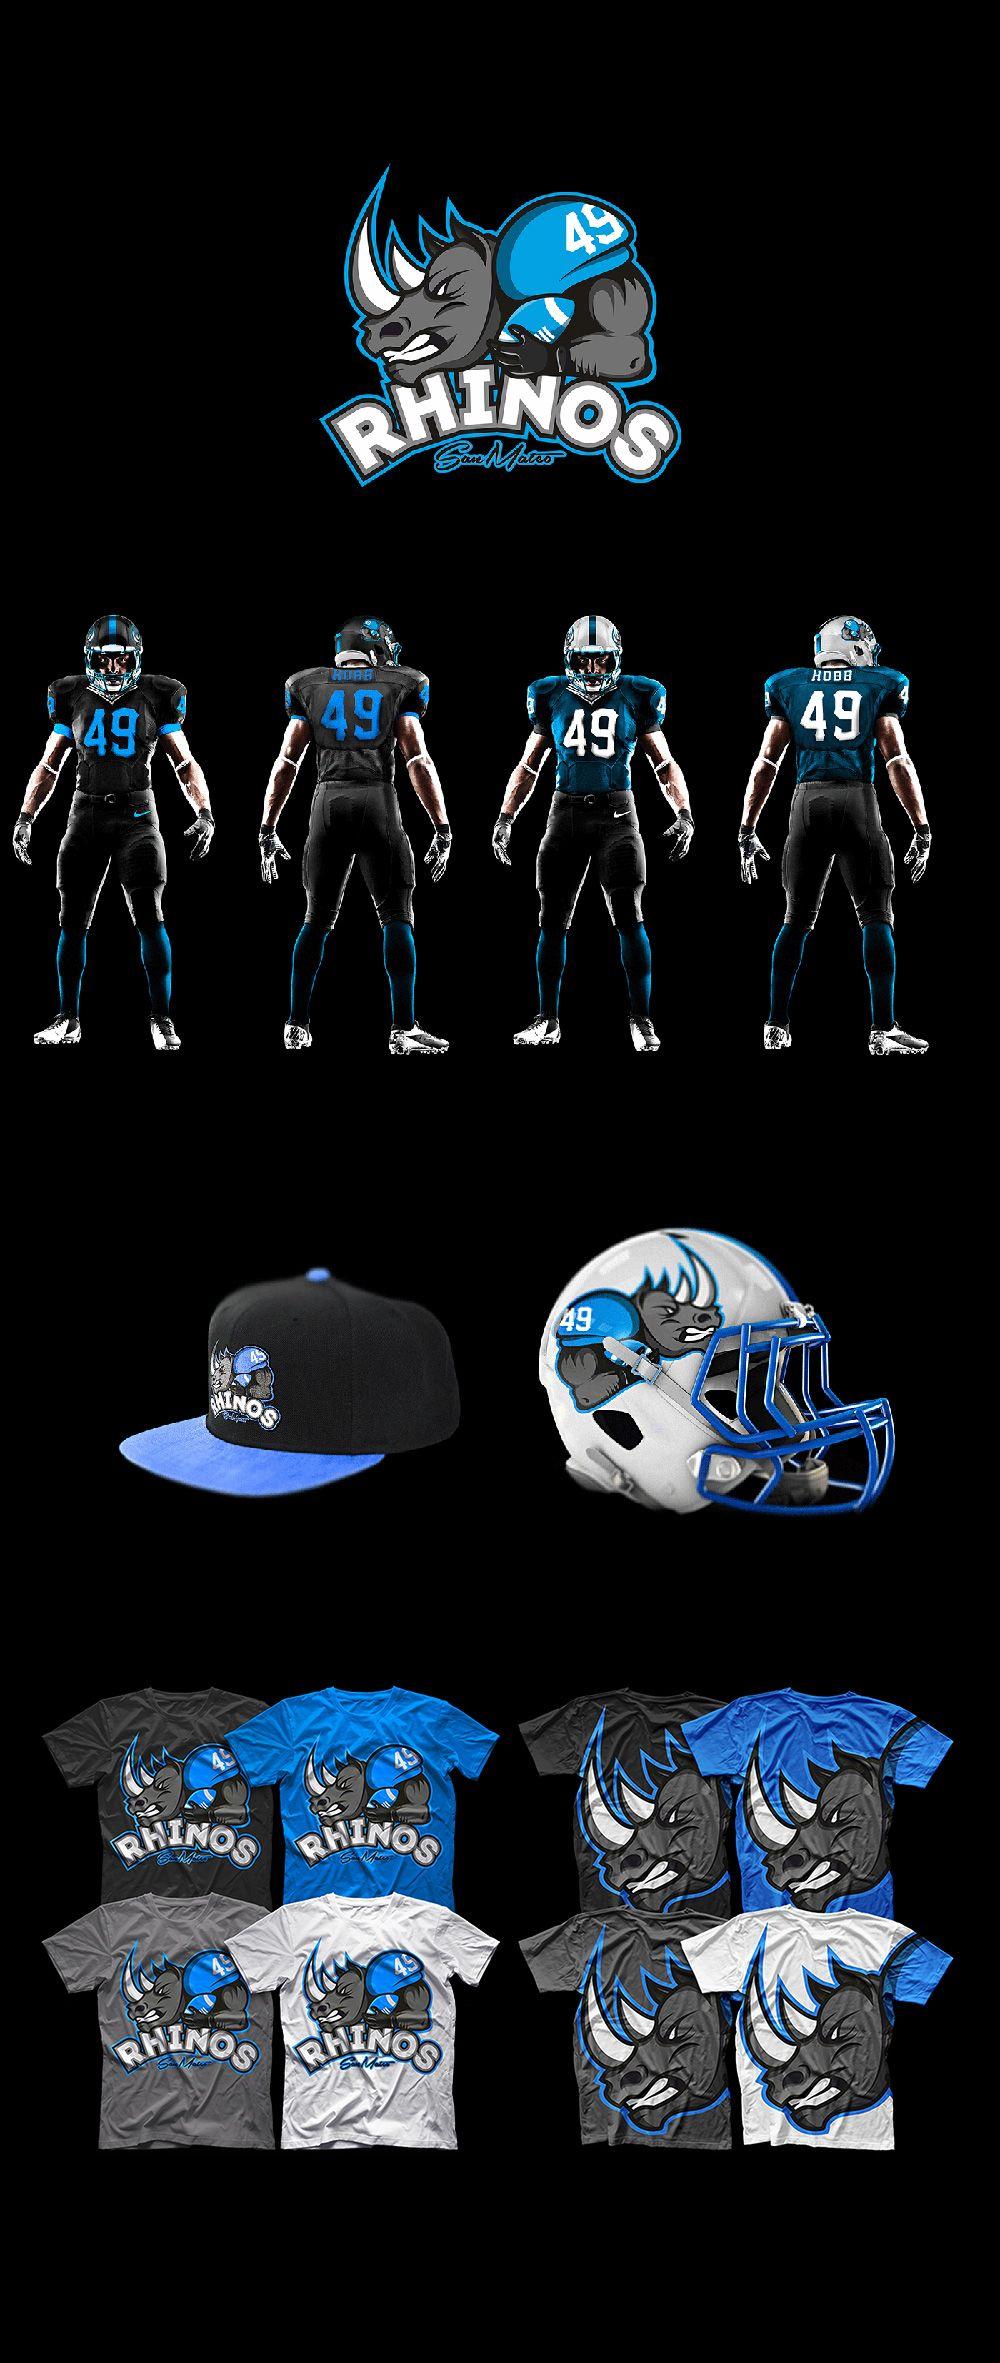 55 Amazing American Football Team Logos and Identity